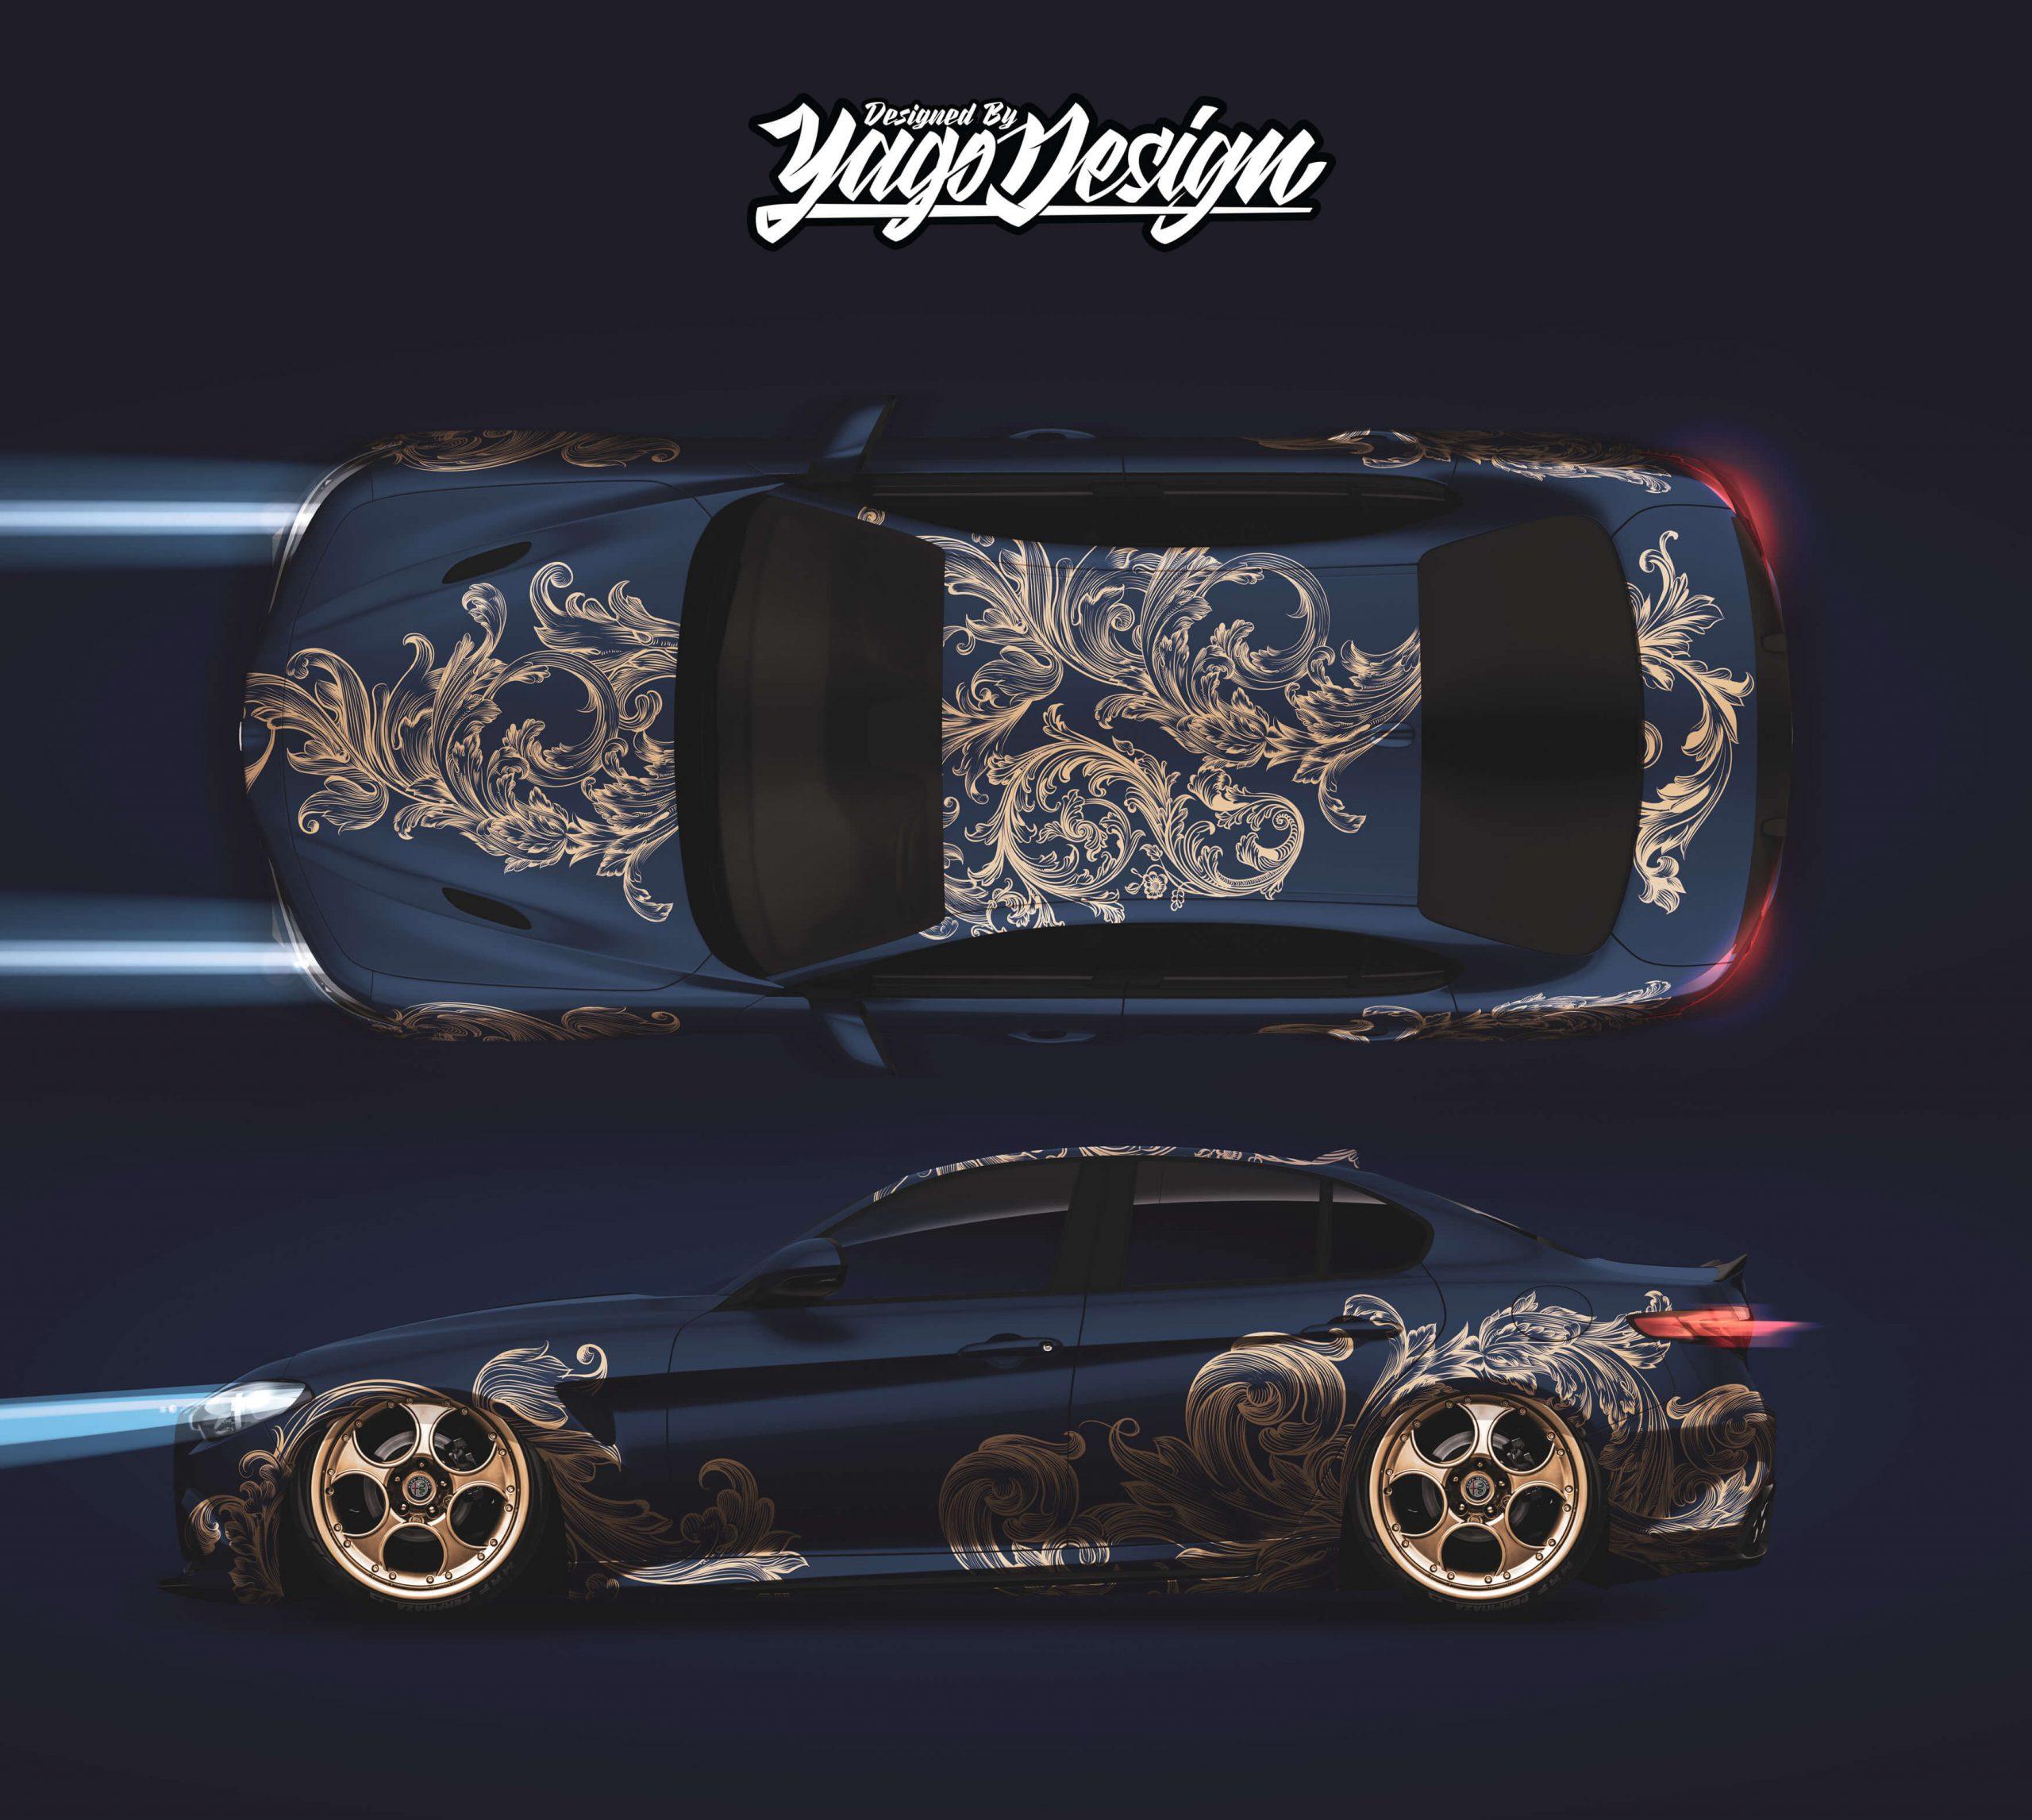 Alfa-Romeo-Giulia-by-Yagodesigns-2019-3500